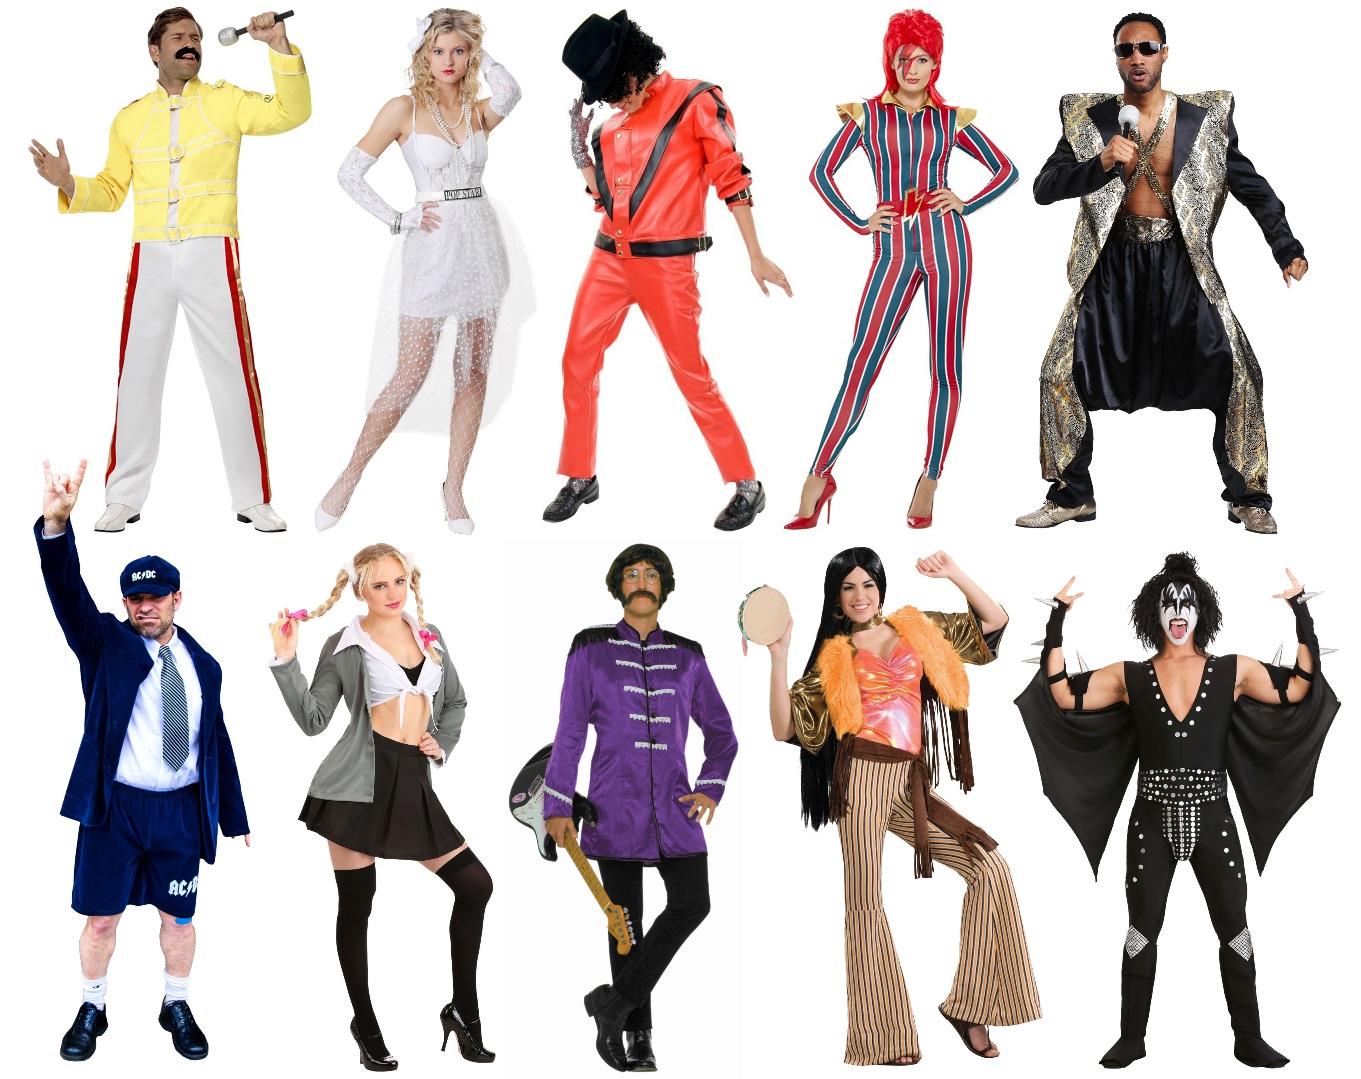 Classic Musician Costumes